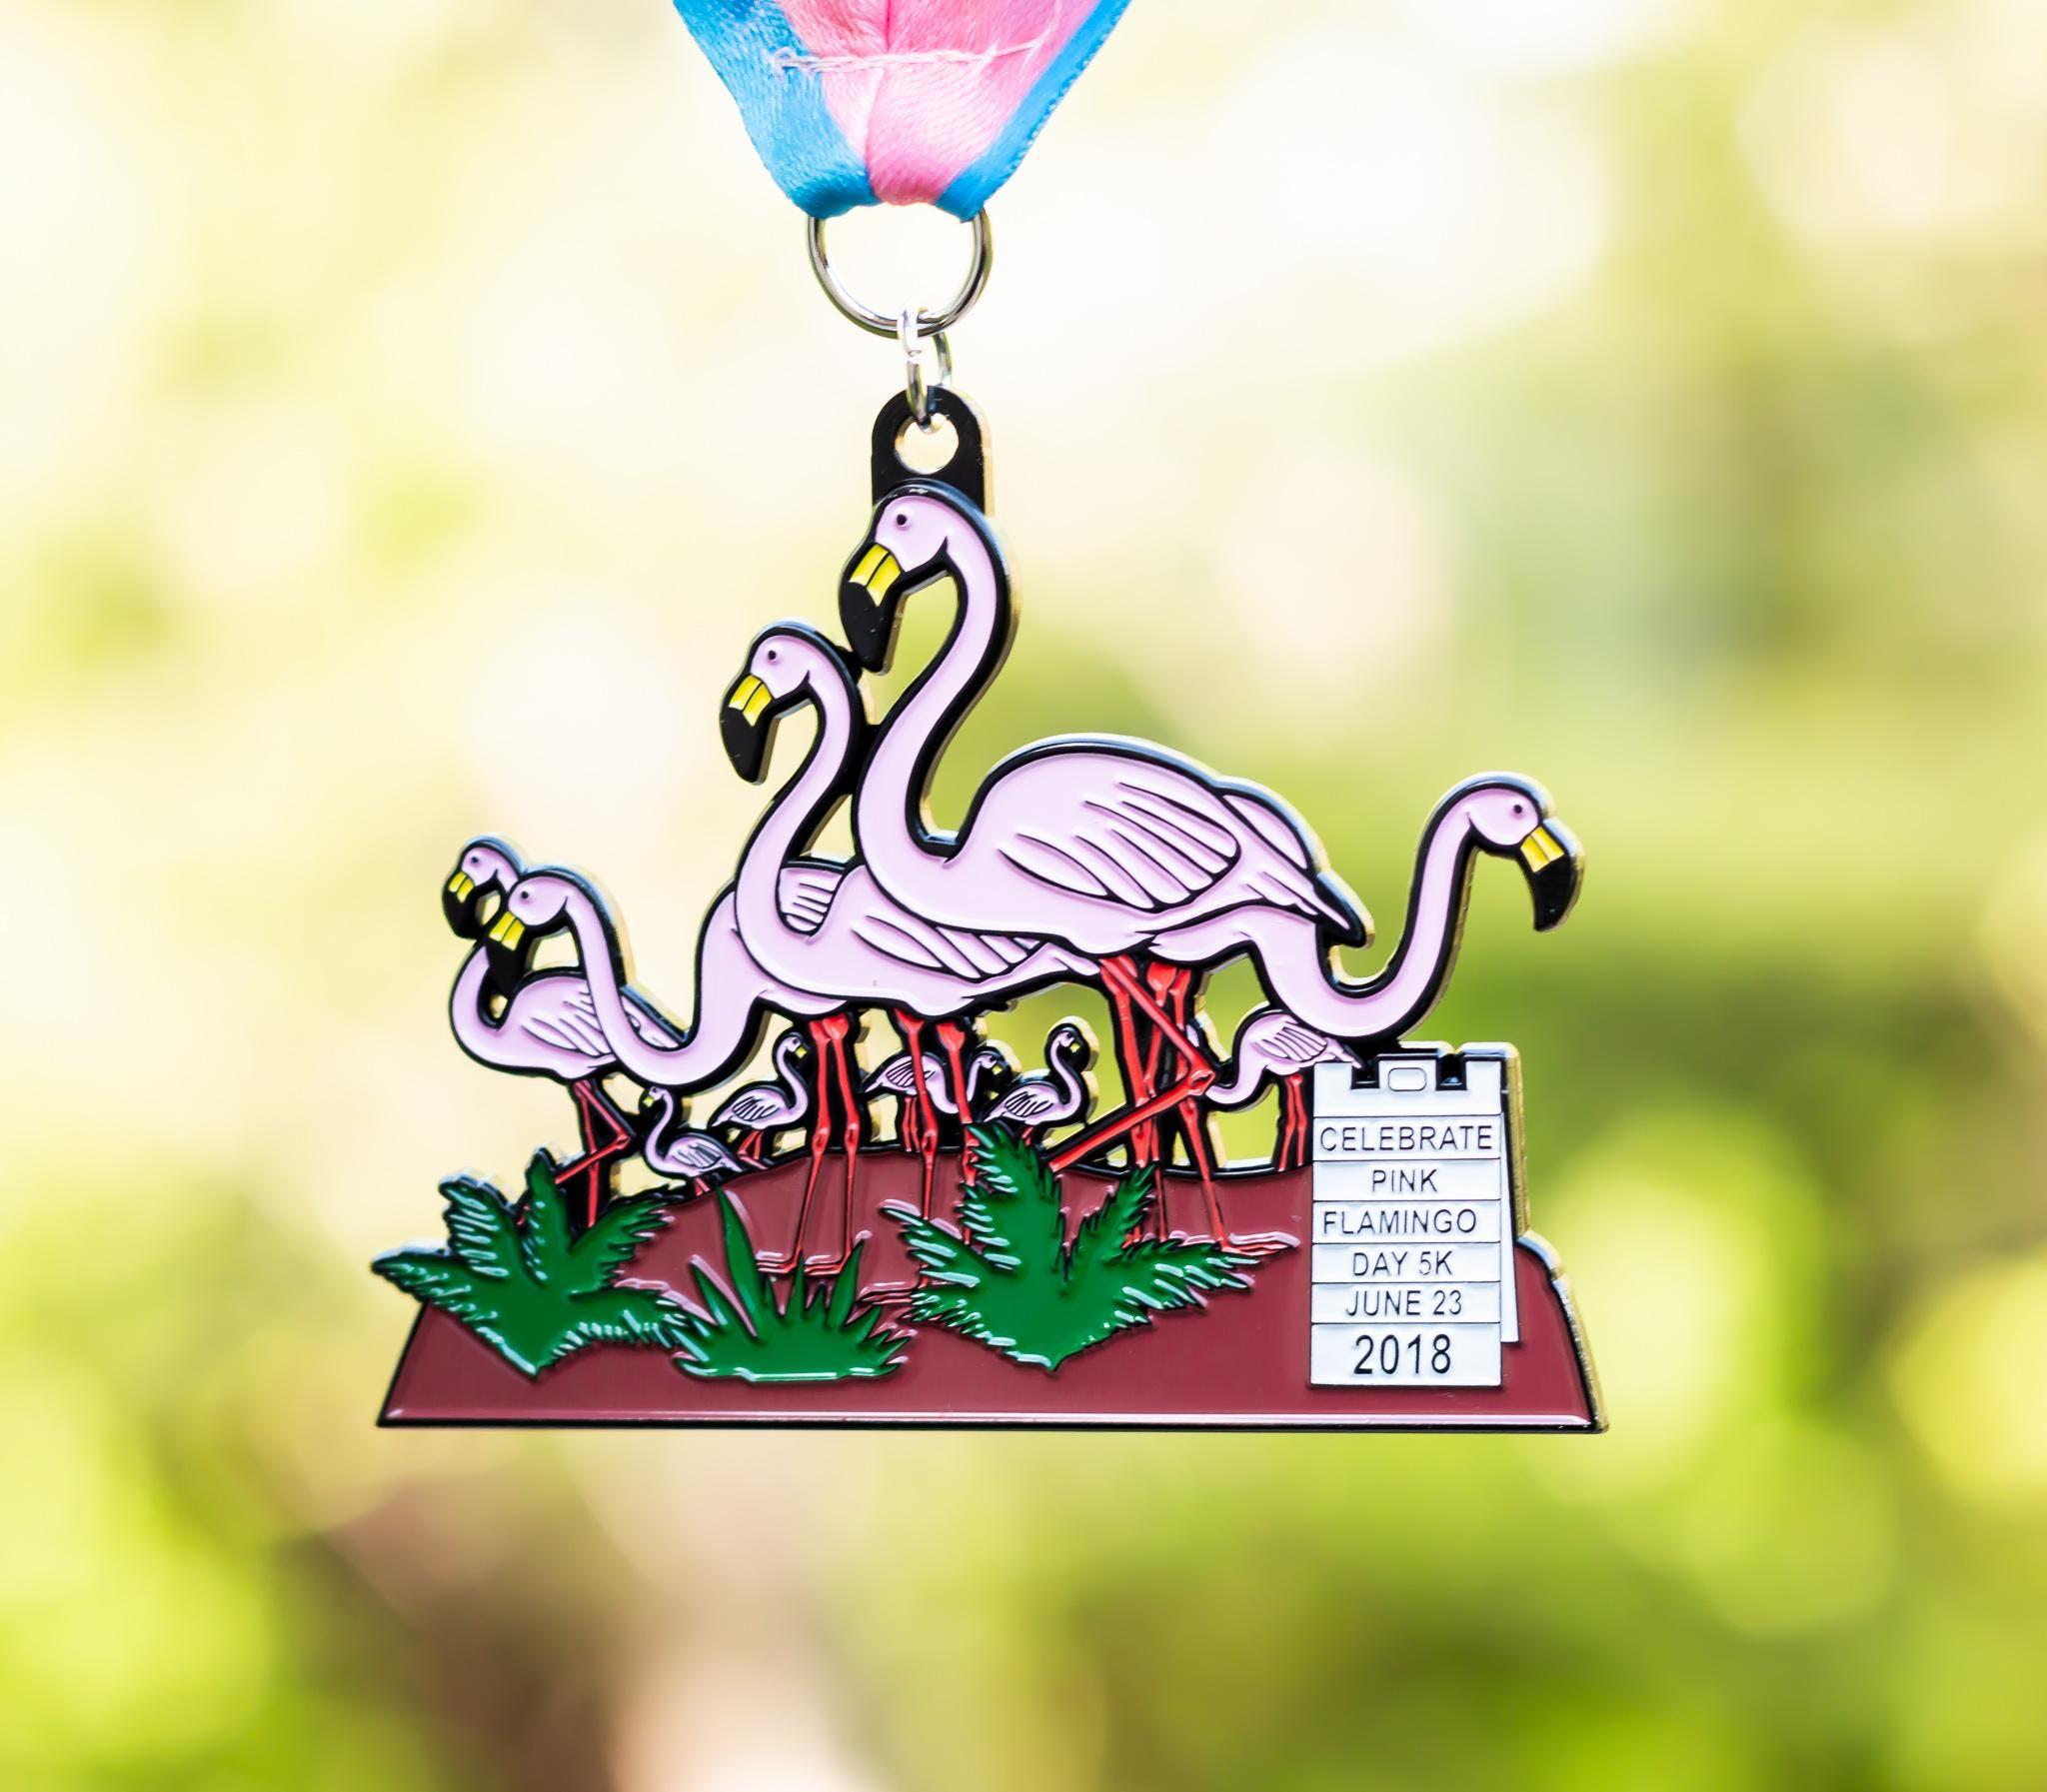 Flamingo Day 5K -Huntington Beach